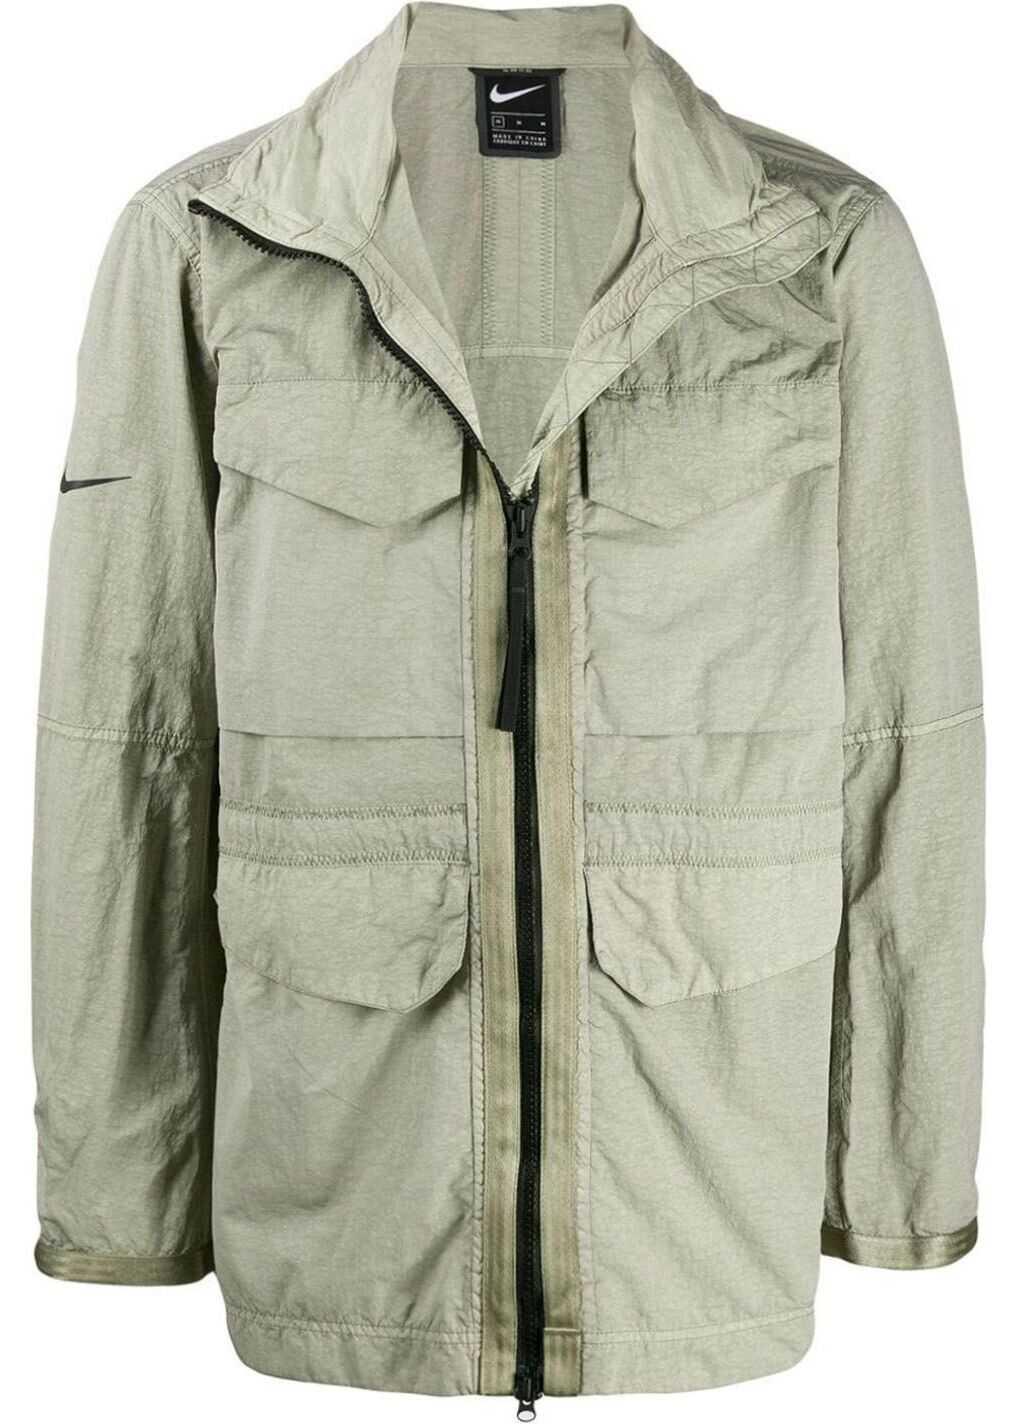 Nike Polyamide Outerwear Jacket BEIGE